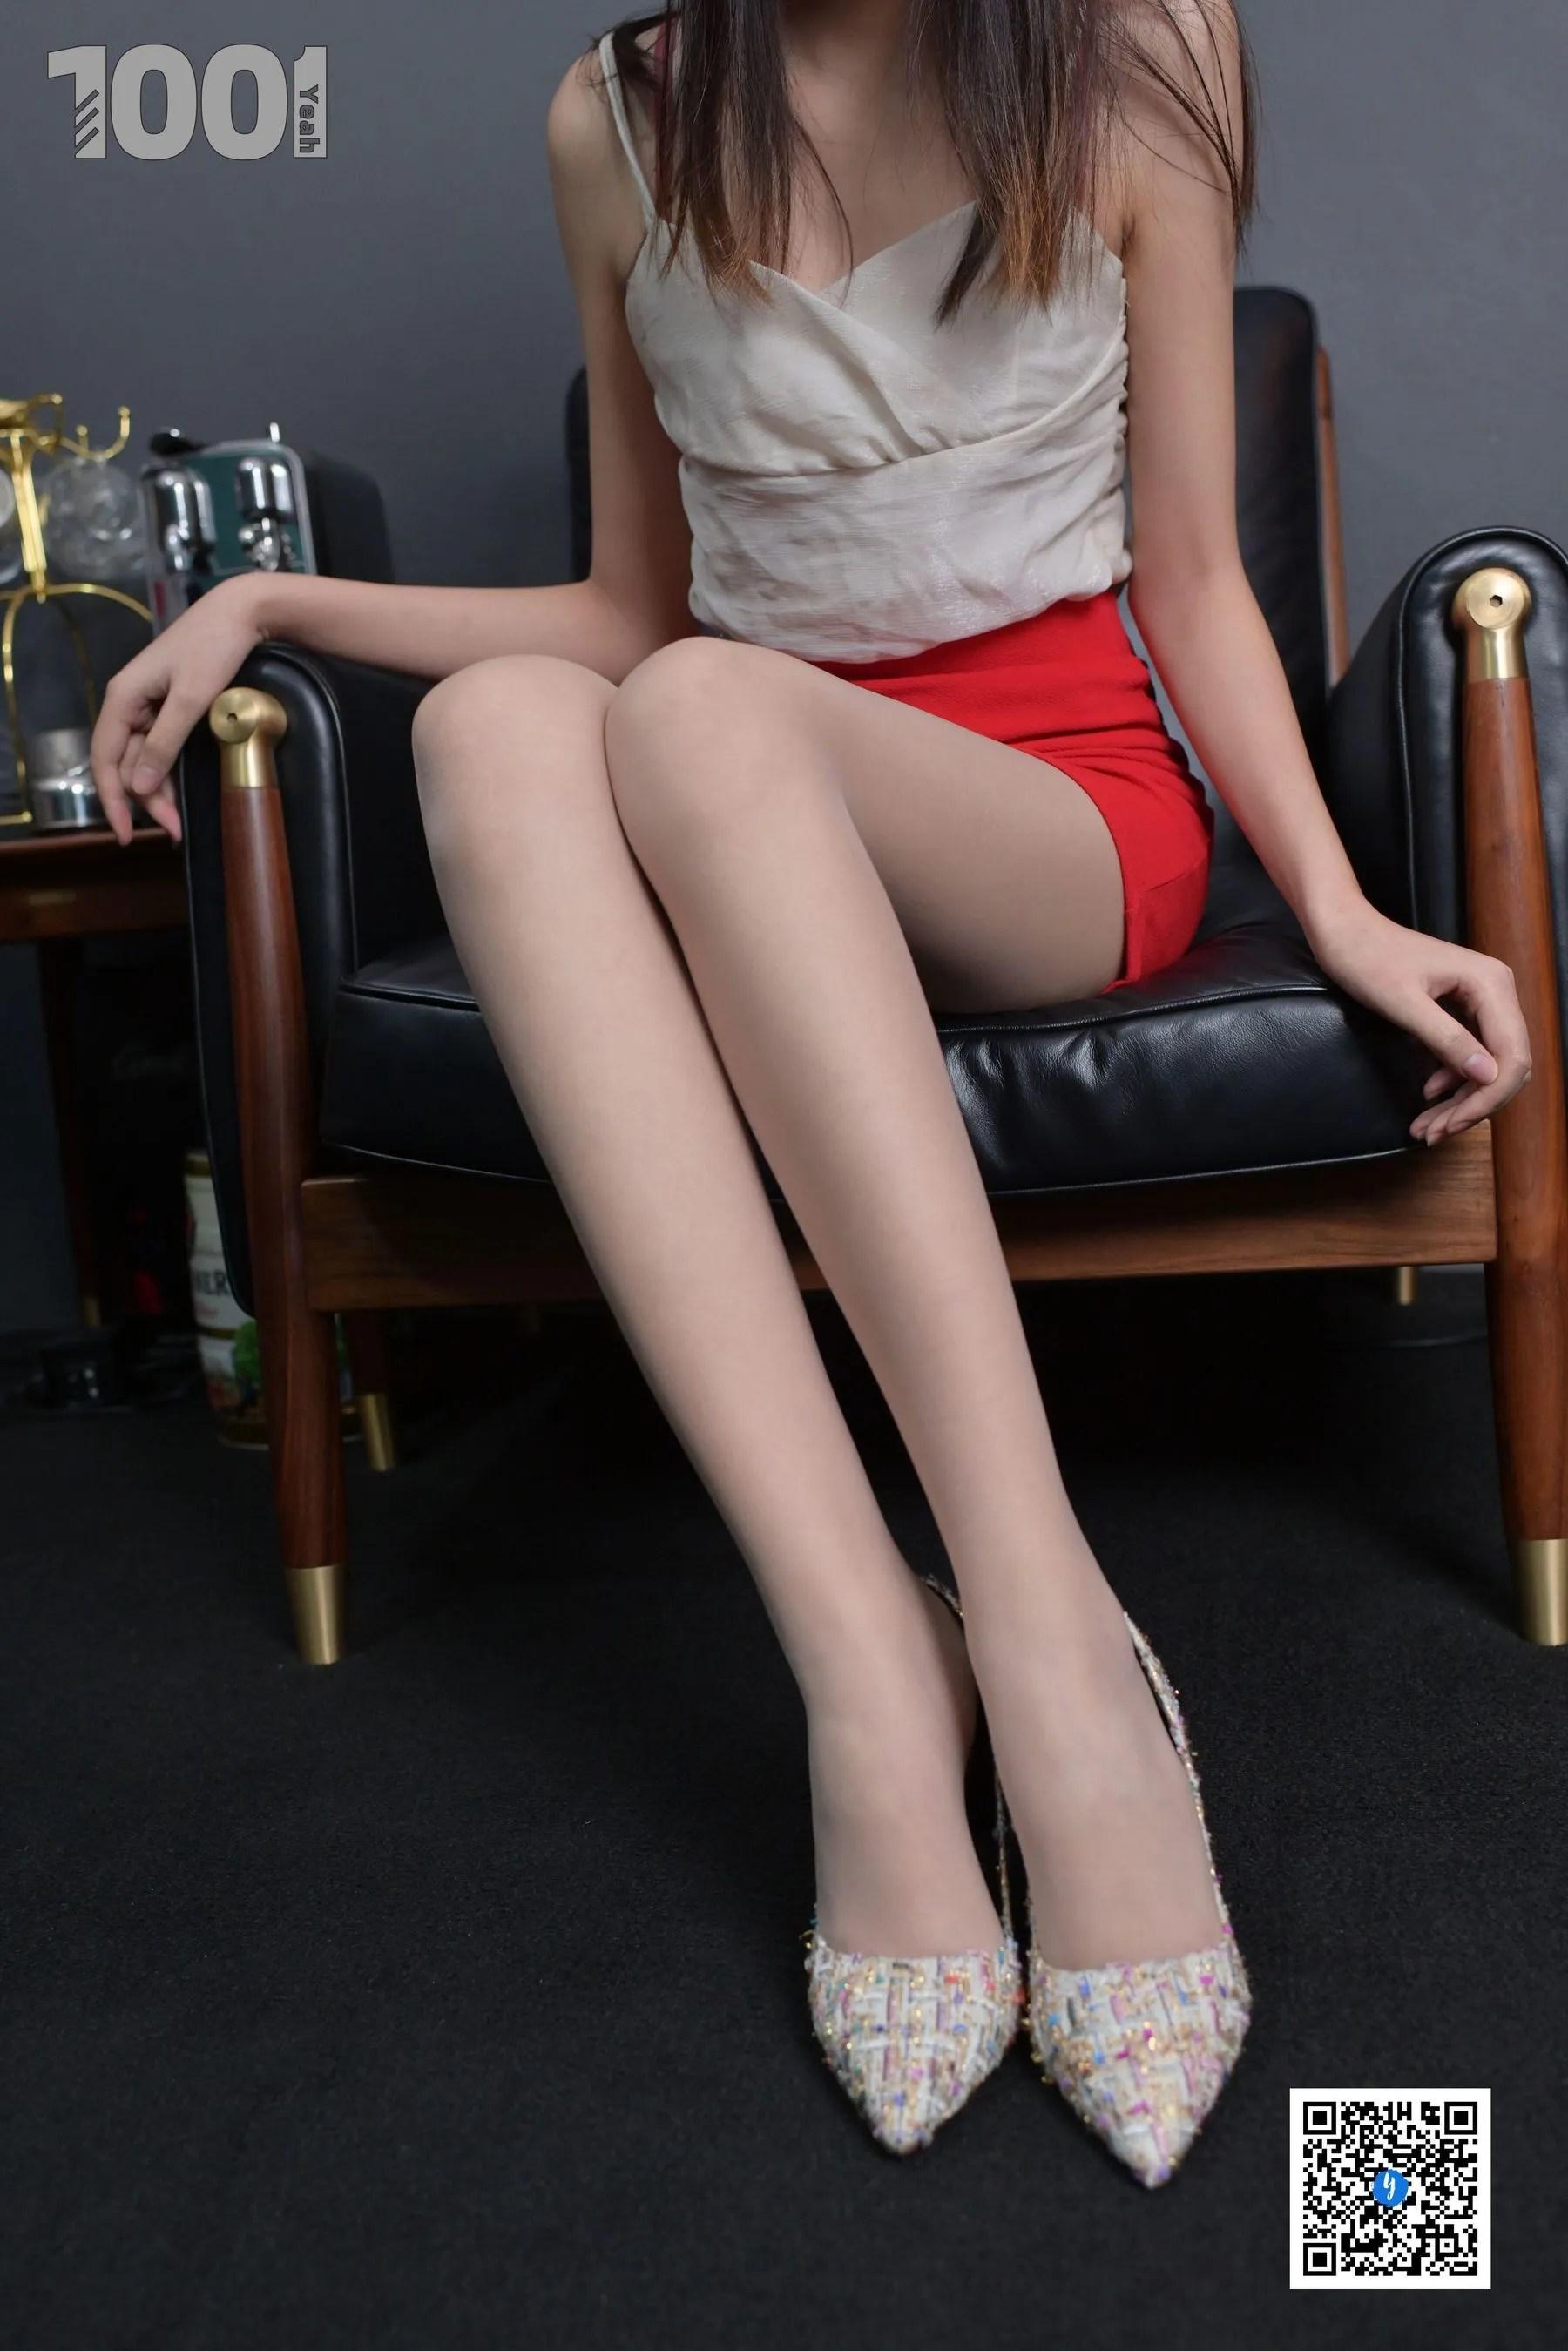 [IESS] NO.187 【一抹红】  丝袜美腿写真[87P]插图(11)